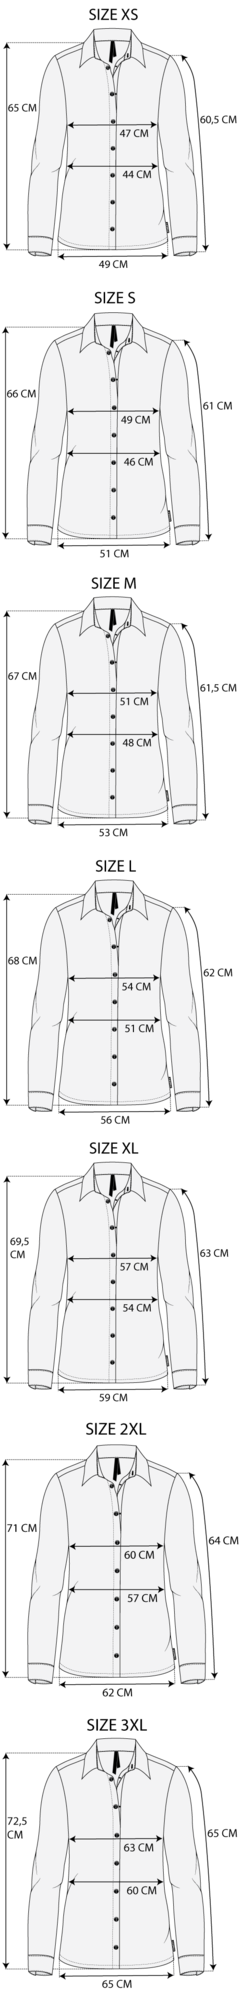 Maattabel blouse travel